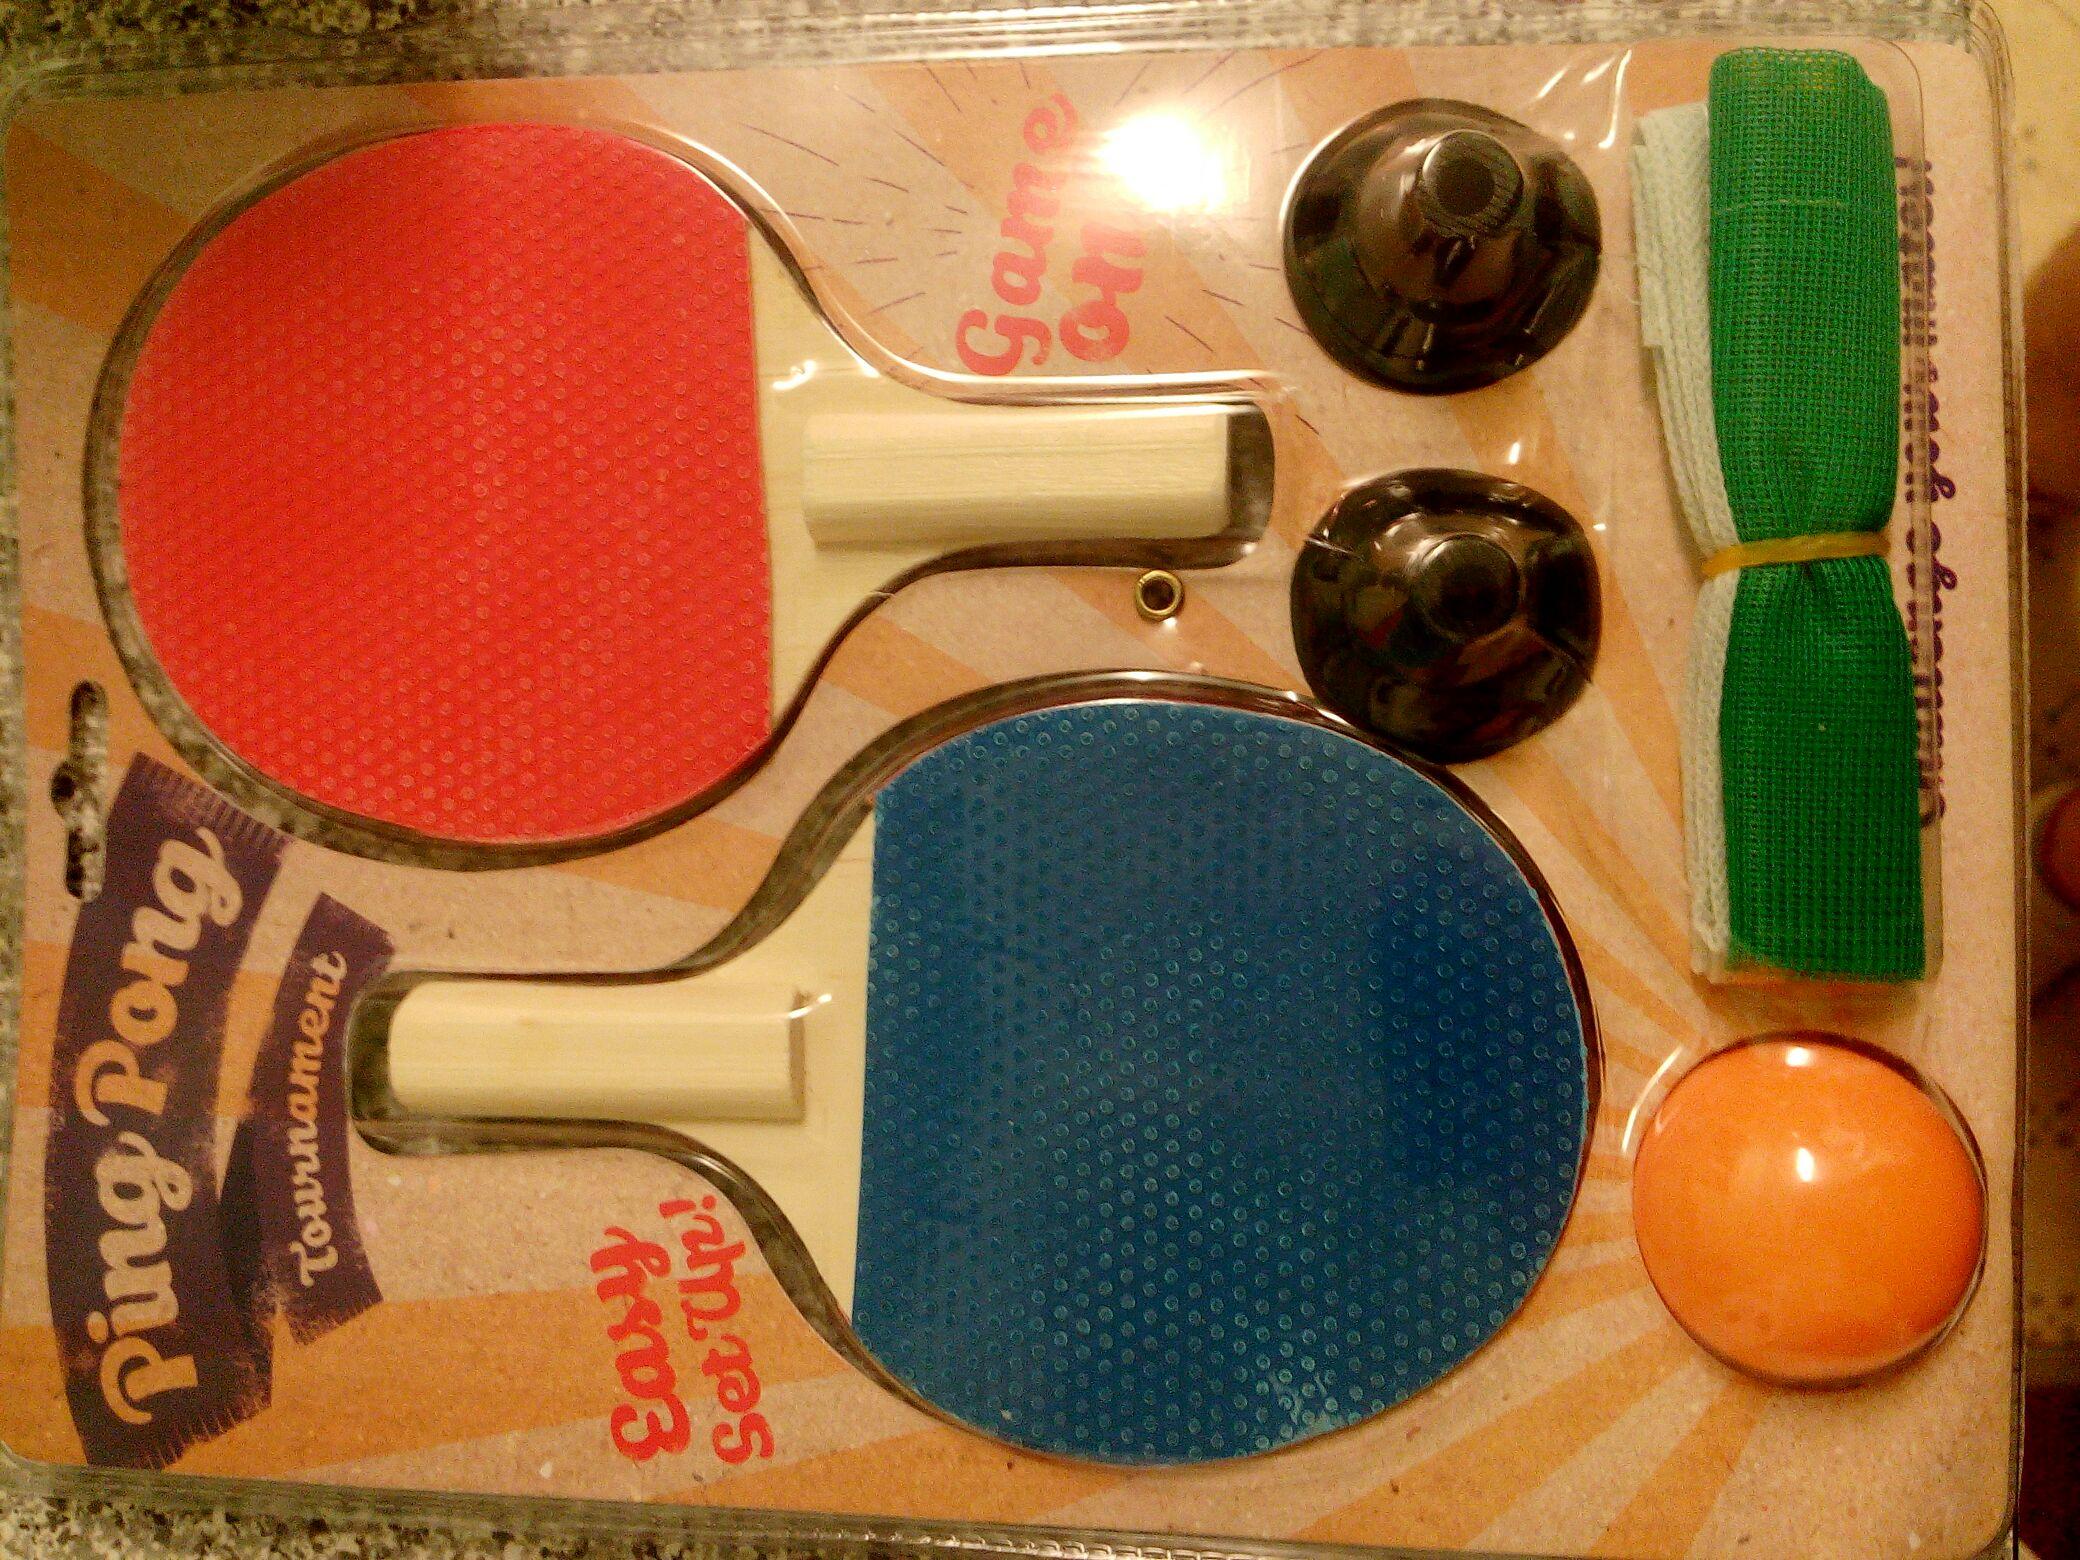 Ping pong Tournament set £1!!! @ poundland